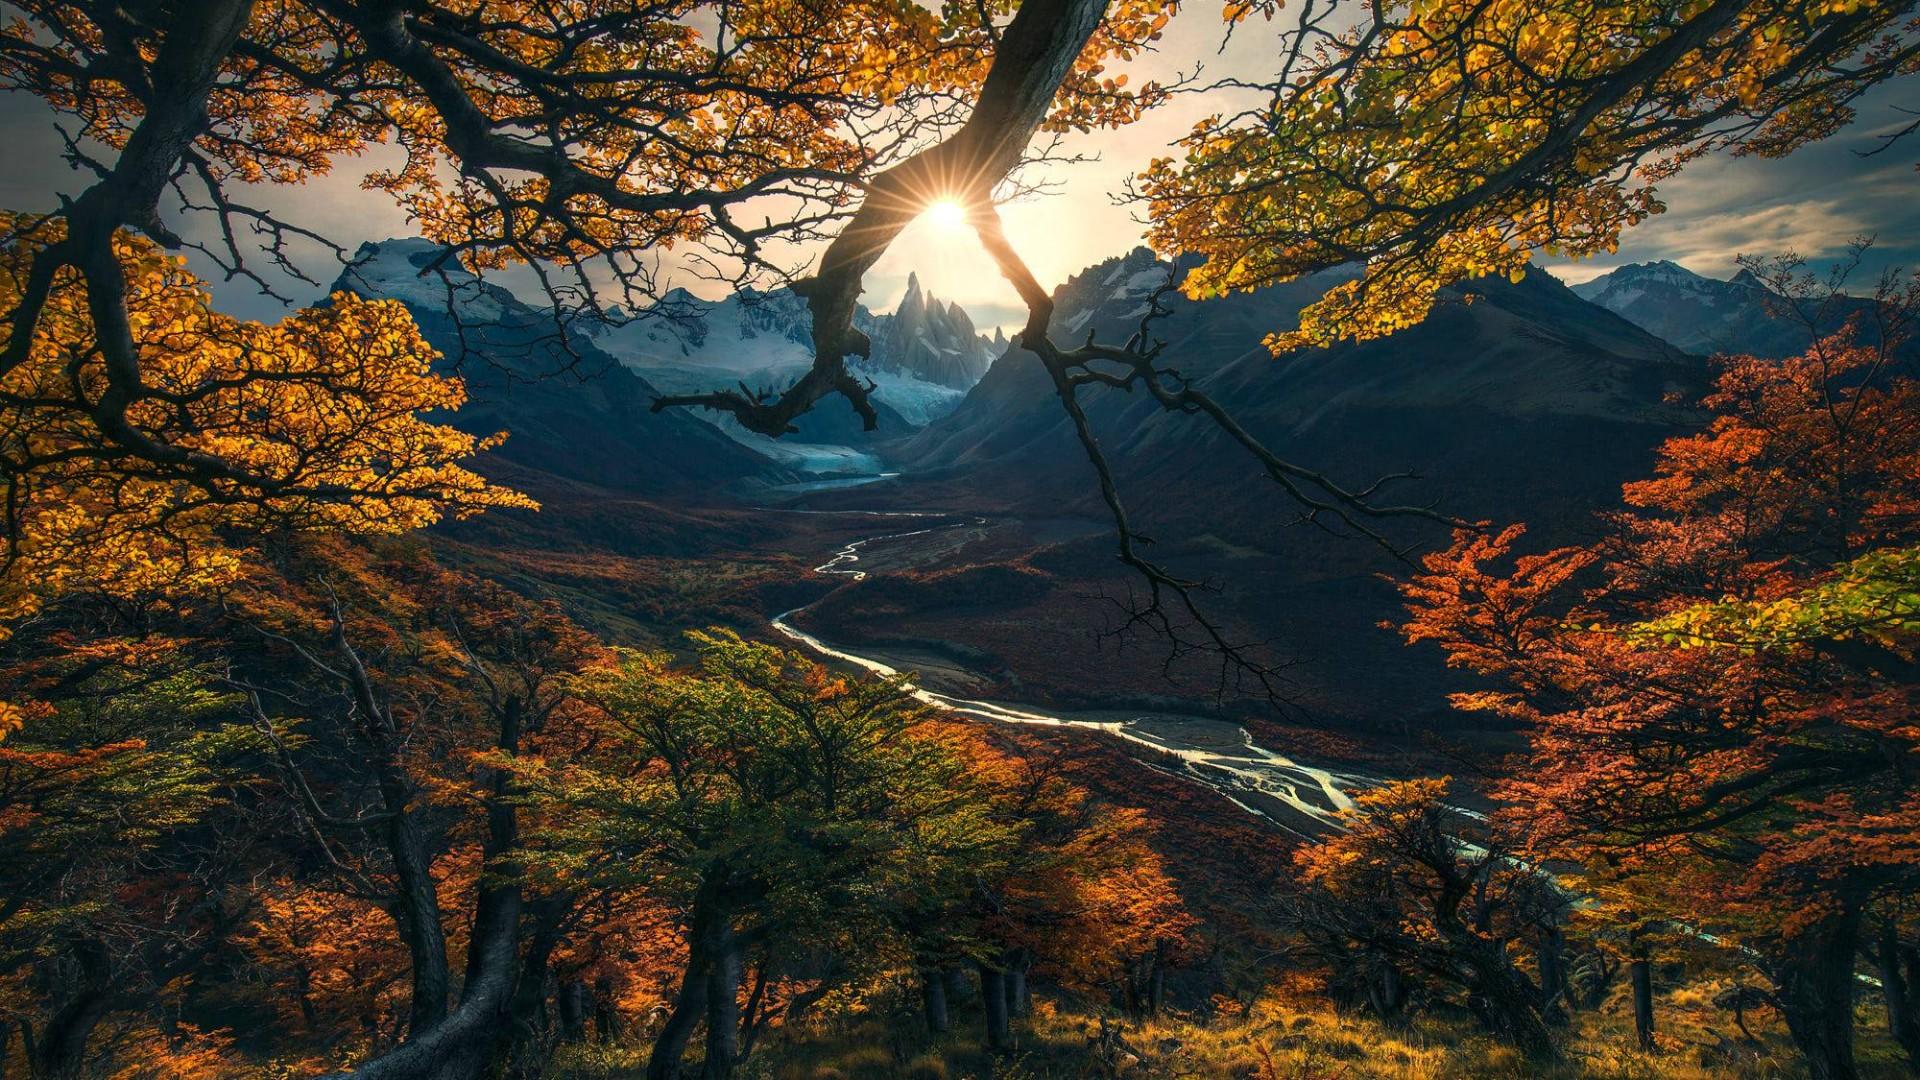 1920x1080 Fall Hd Wallpaper Wallpaper Forest Tree Mountains Autumn Hd Nature 15808